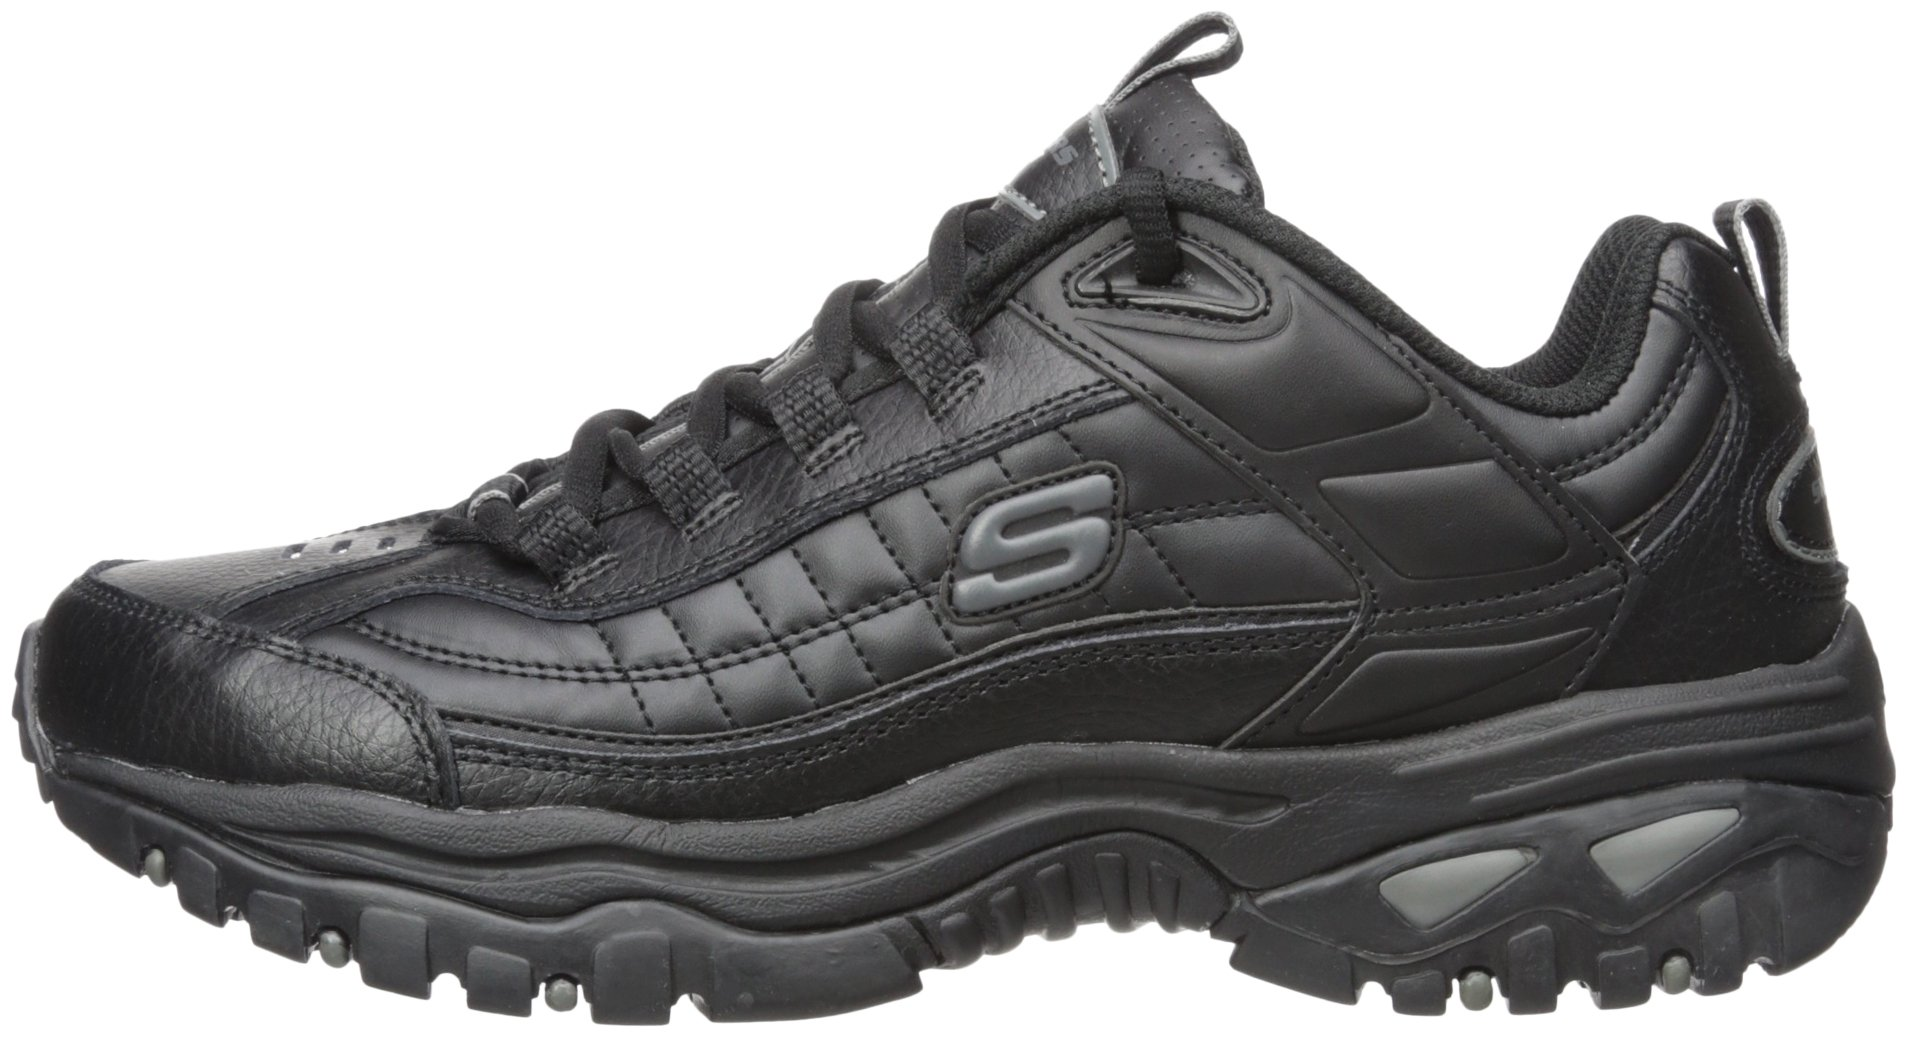 Skechers Sport Men's Energy Afterburn Lace-Up Sneaker,Black,13 M by Skechers (Image #5)